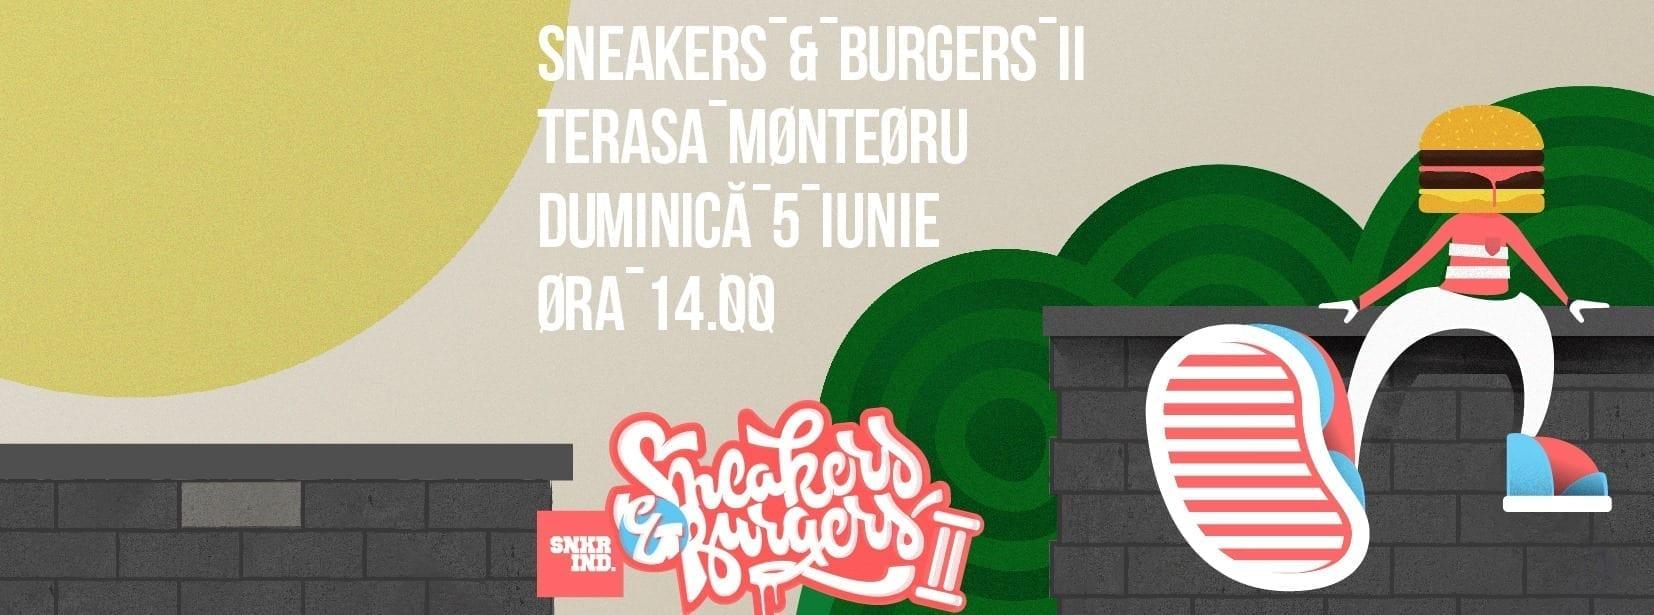 Sneakers & Burgers II @ Terasa Monteoru